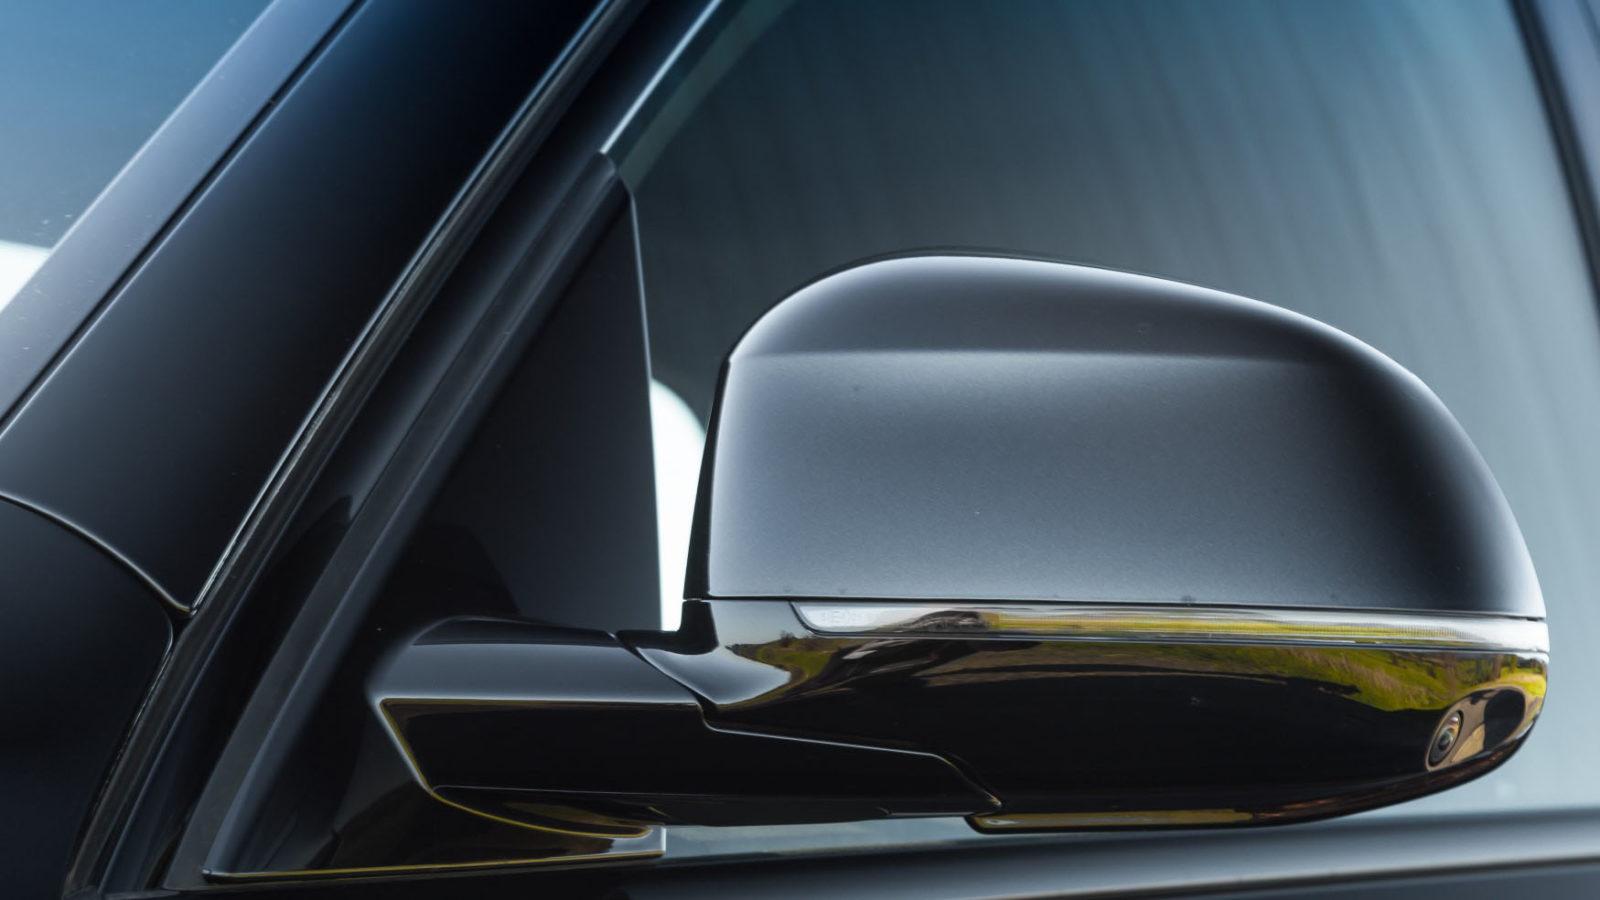 Novyj 2020 BMW X5: foto, tehnicheskie harakteristiki, jekster'er